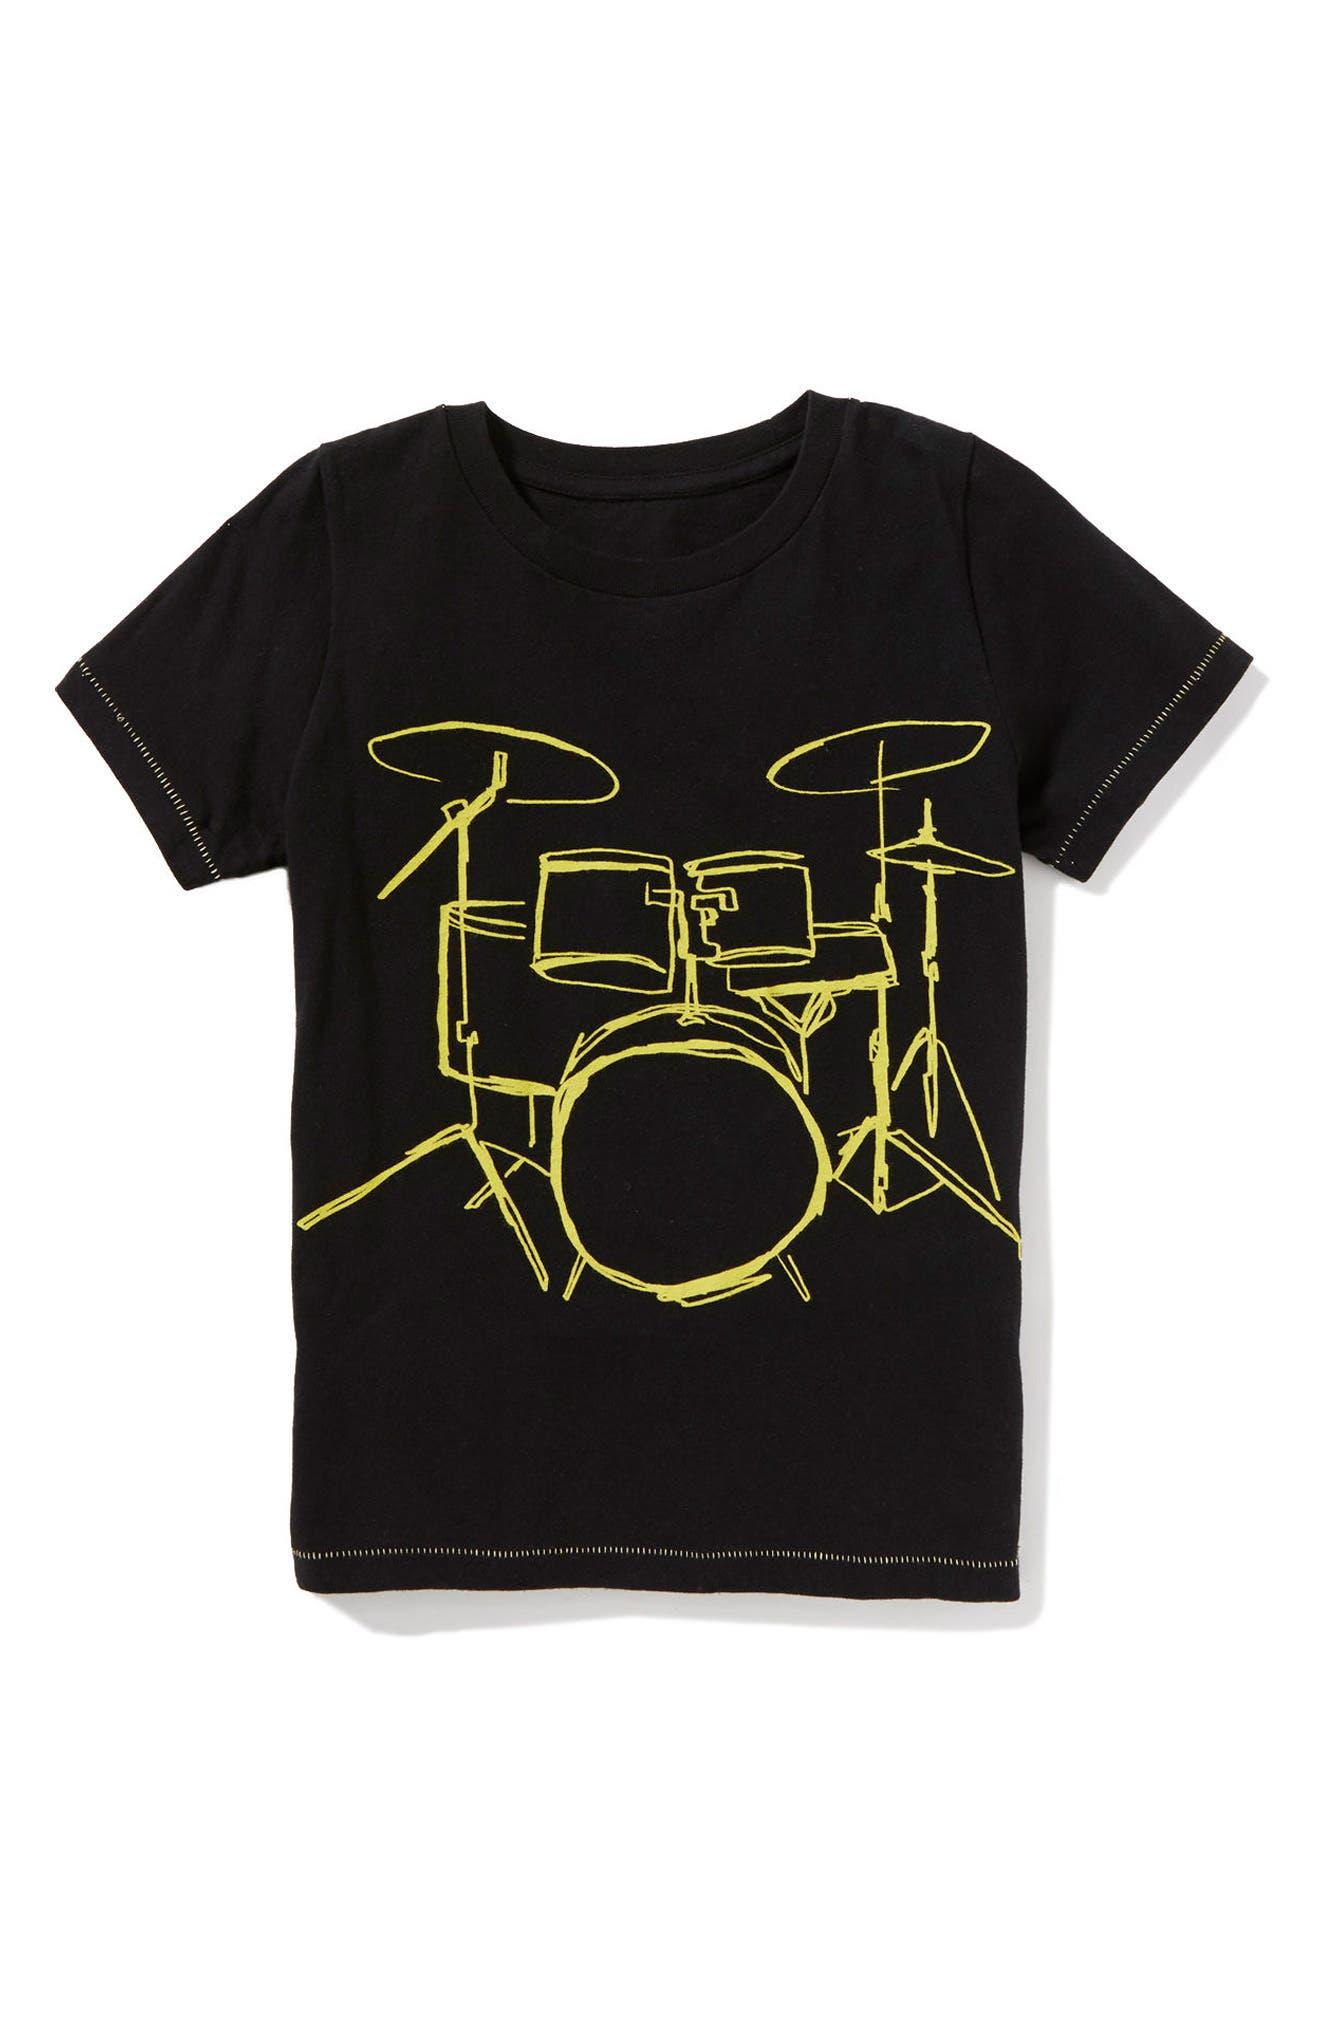 Alternate Image 1 Selected - Peek Drummer Wanted Graphic T-Shirt (Toddler Boys, Little Boys & Big Boys)